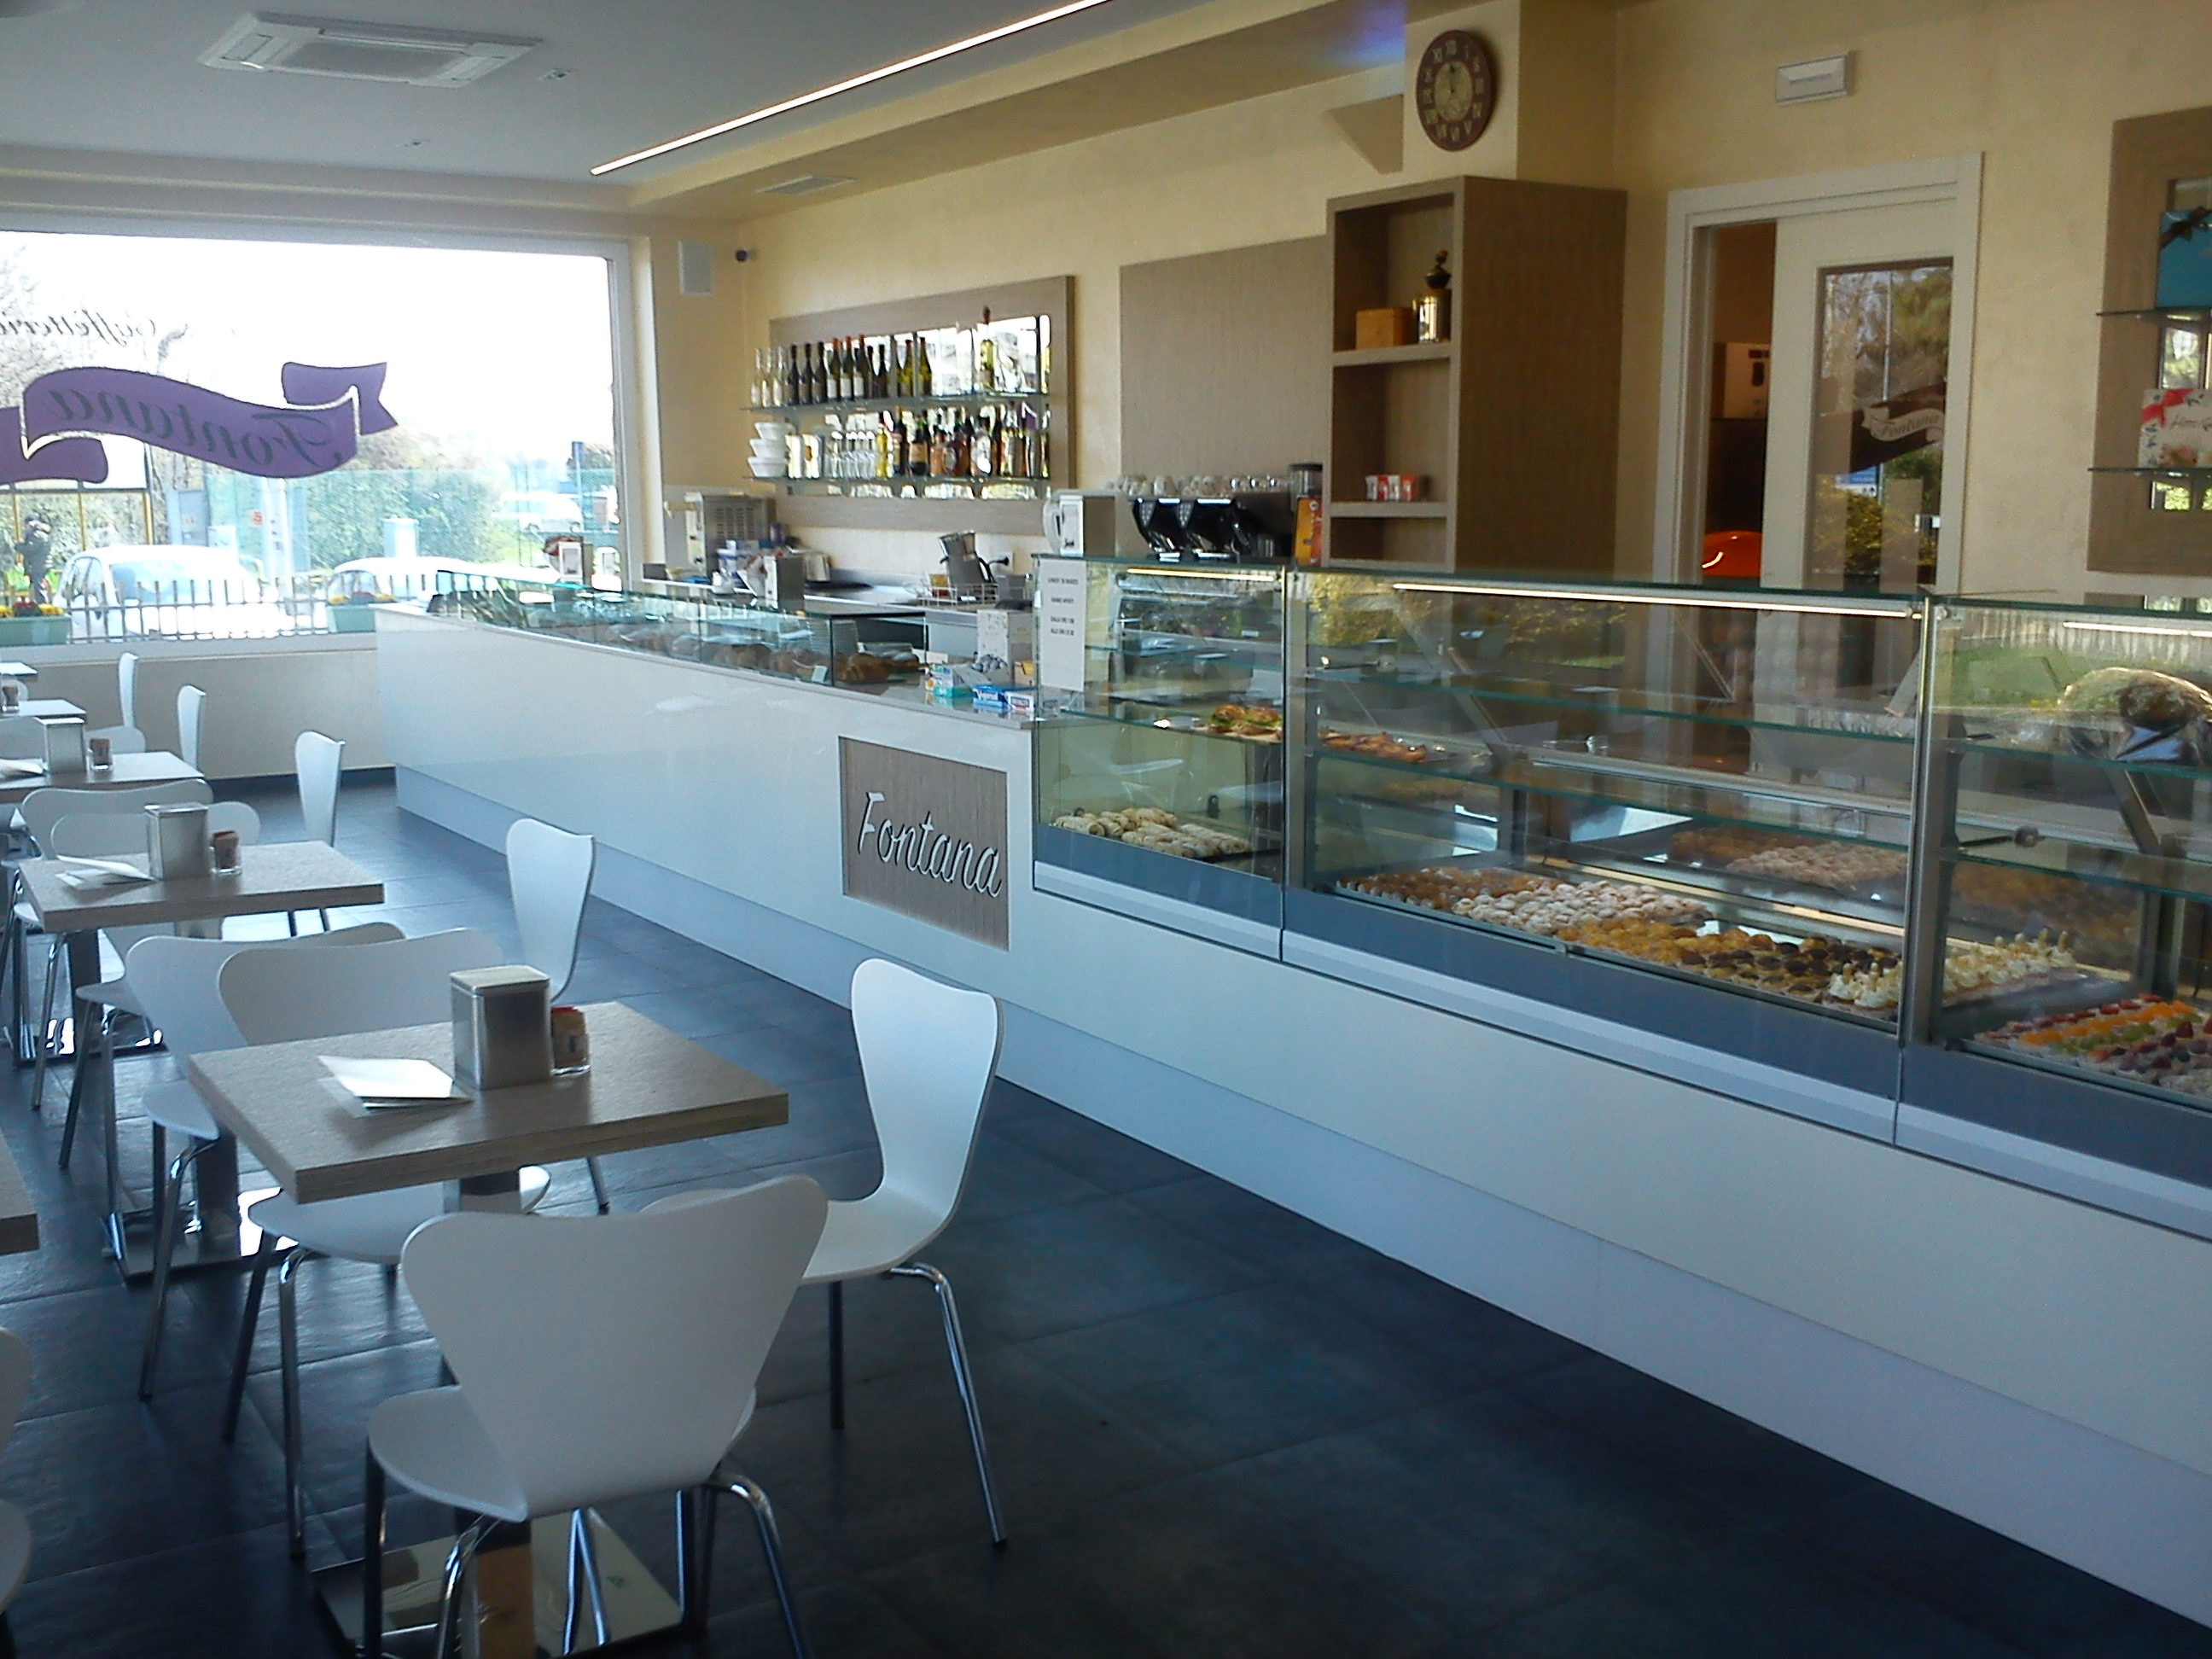 Bar ristoranti negozi mobili bergamo milano astor for Arredamento bar usato milano